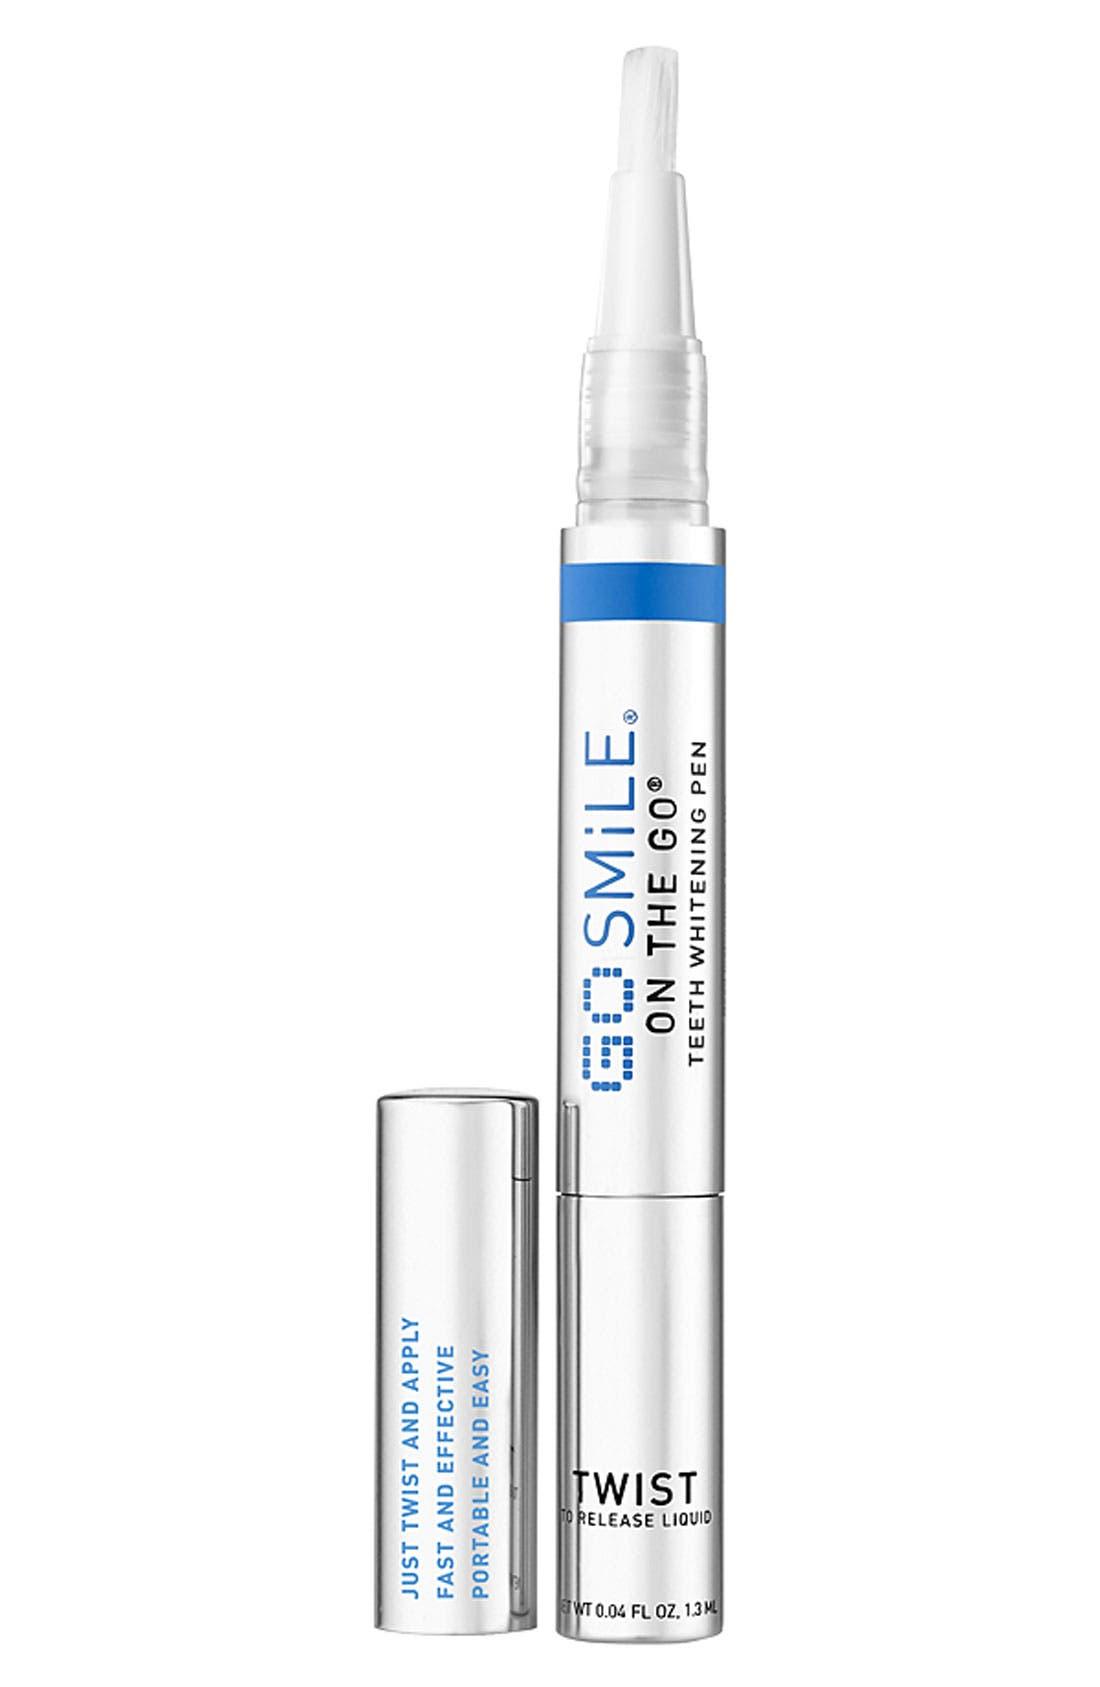 GO SMiLE(R) 'On the Go(R)' Teeth Whitening Pen at Nordstrom